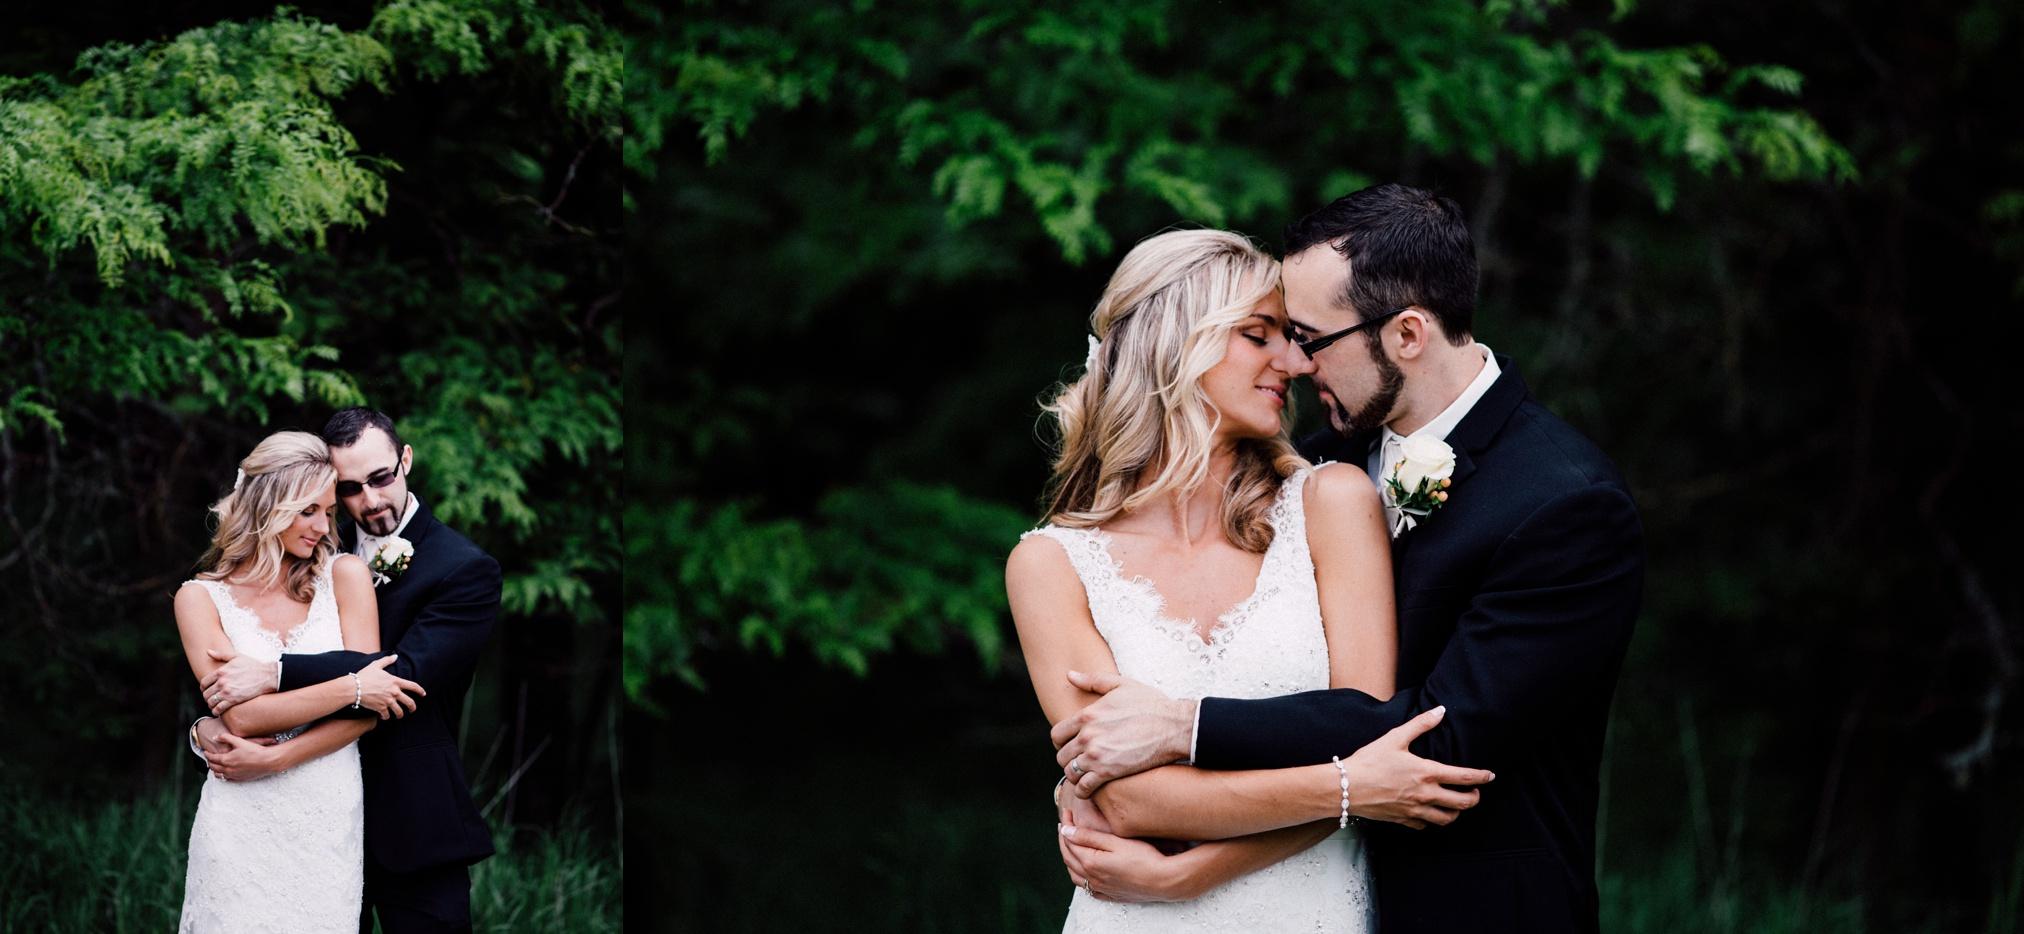 schmid_wedding-660.jpg